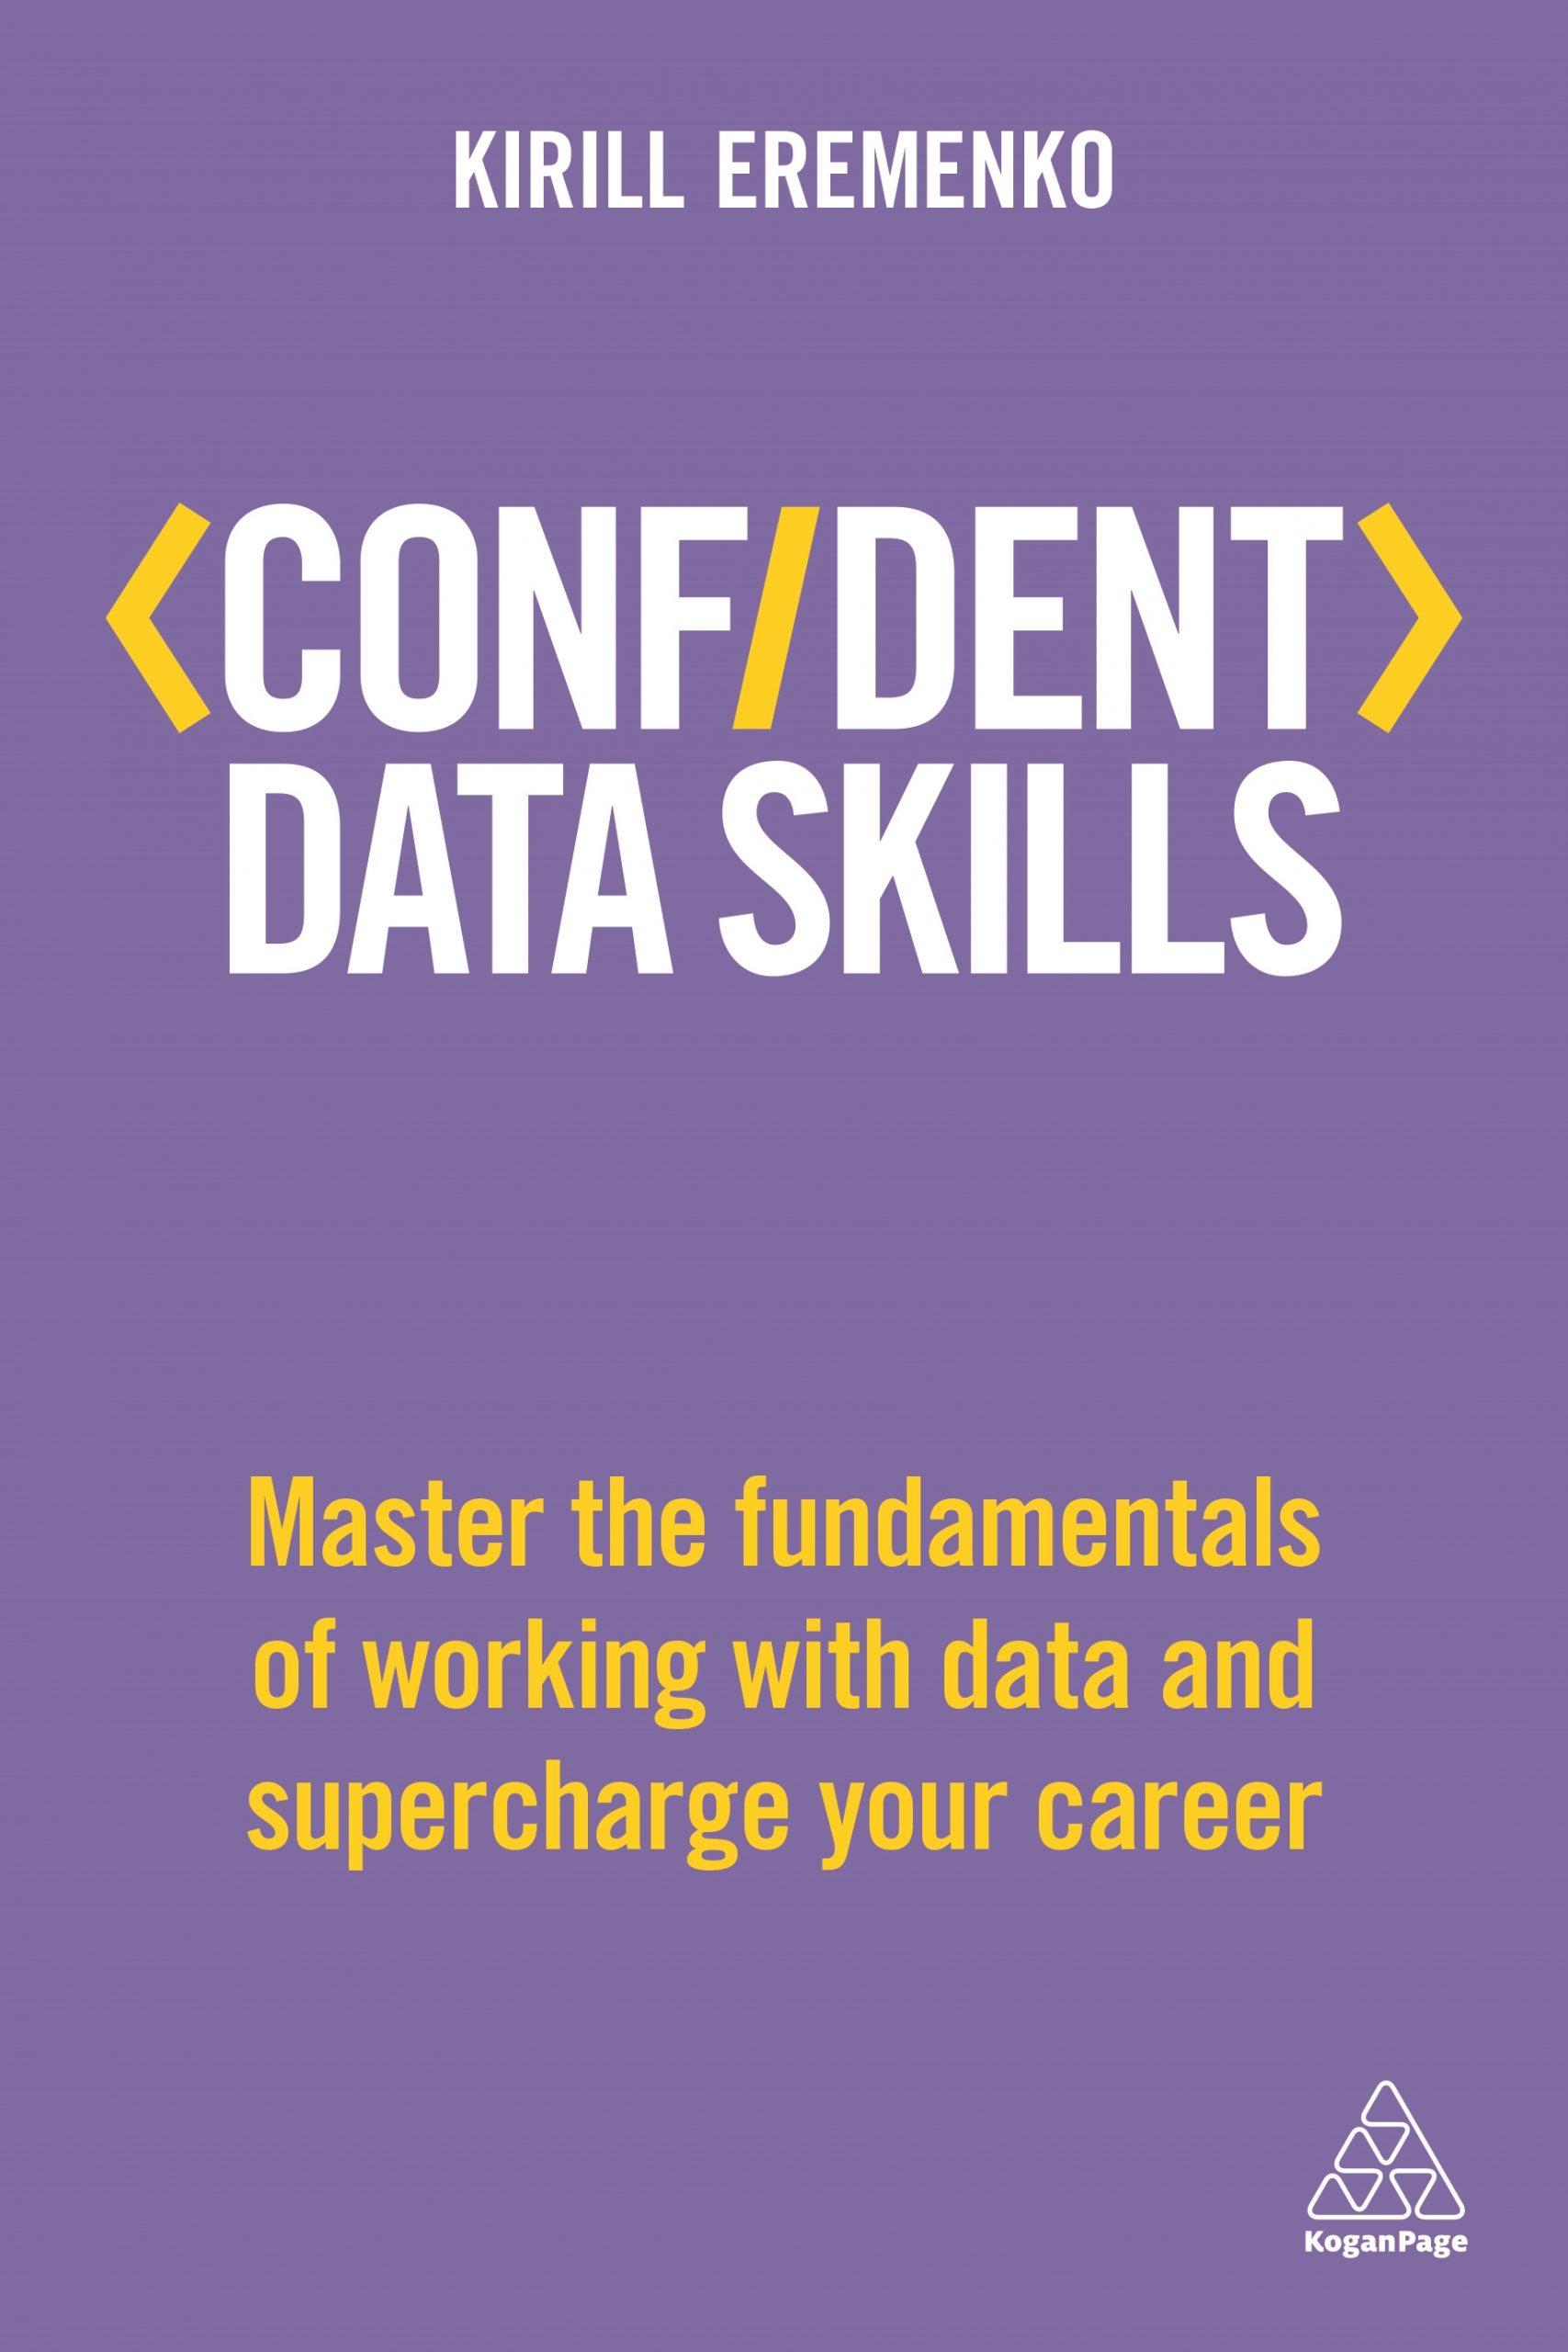 Confident Data Skills - Kirill Eremenko